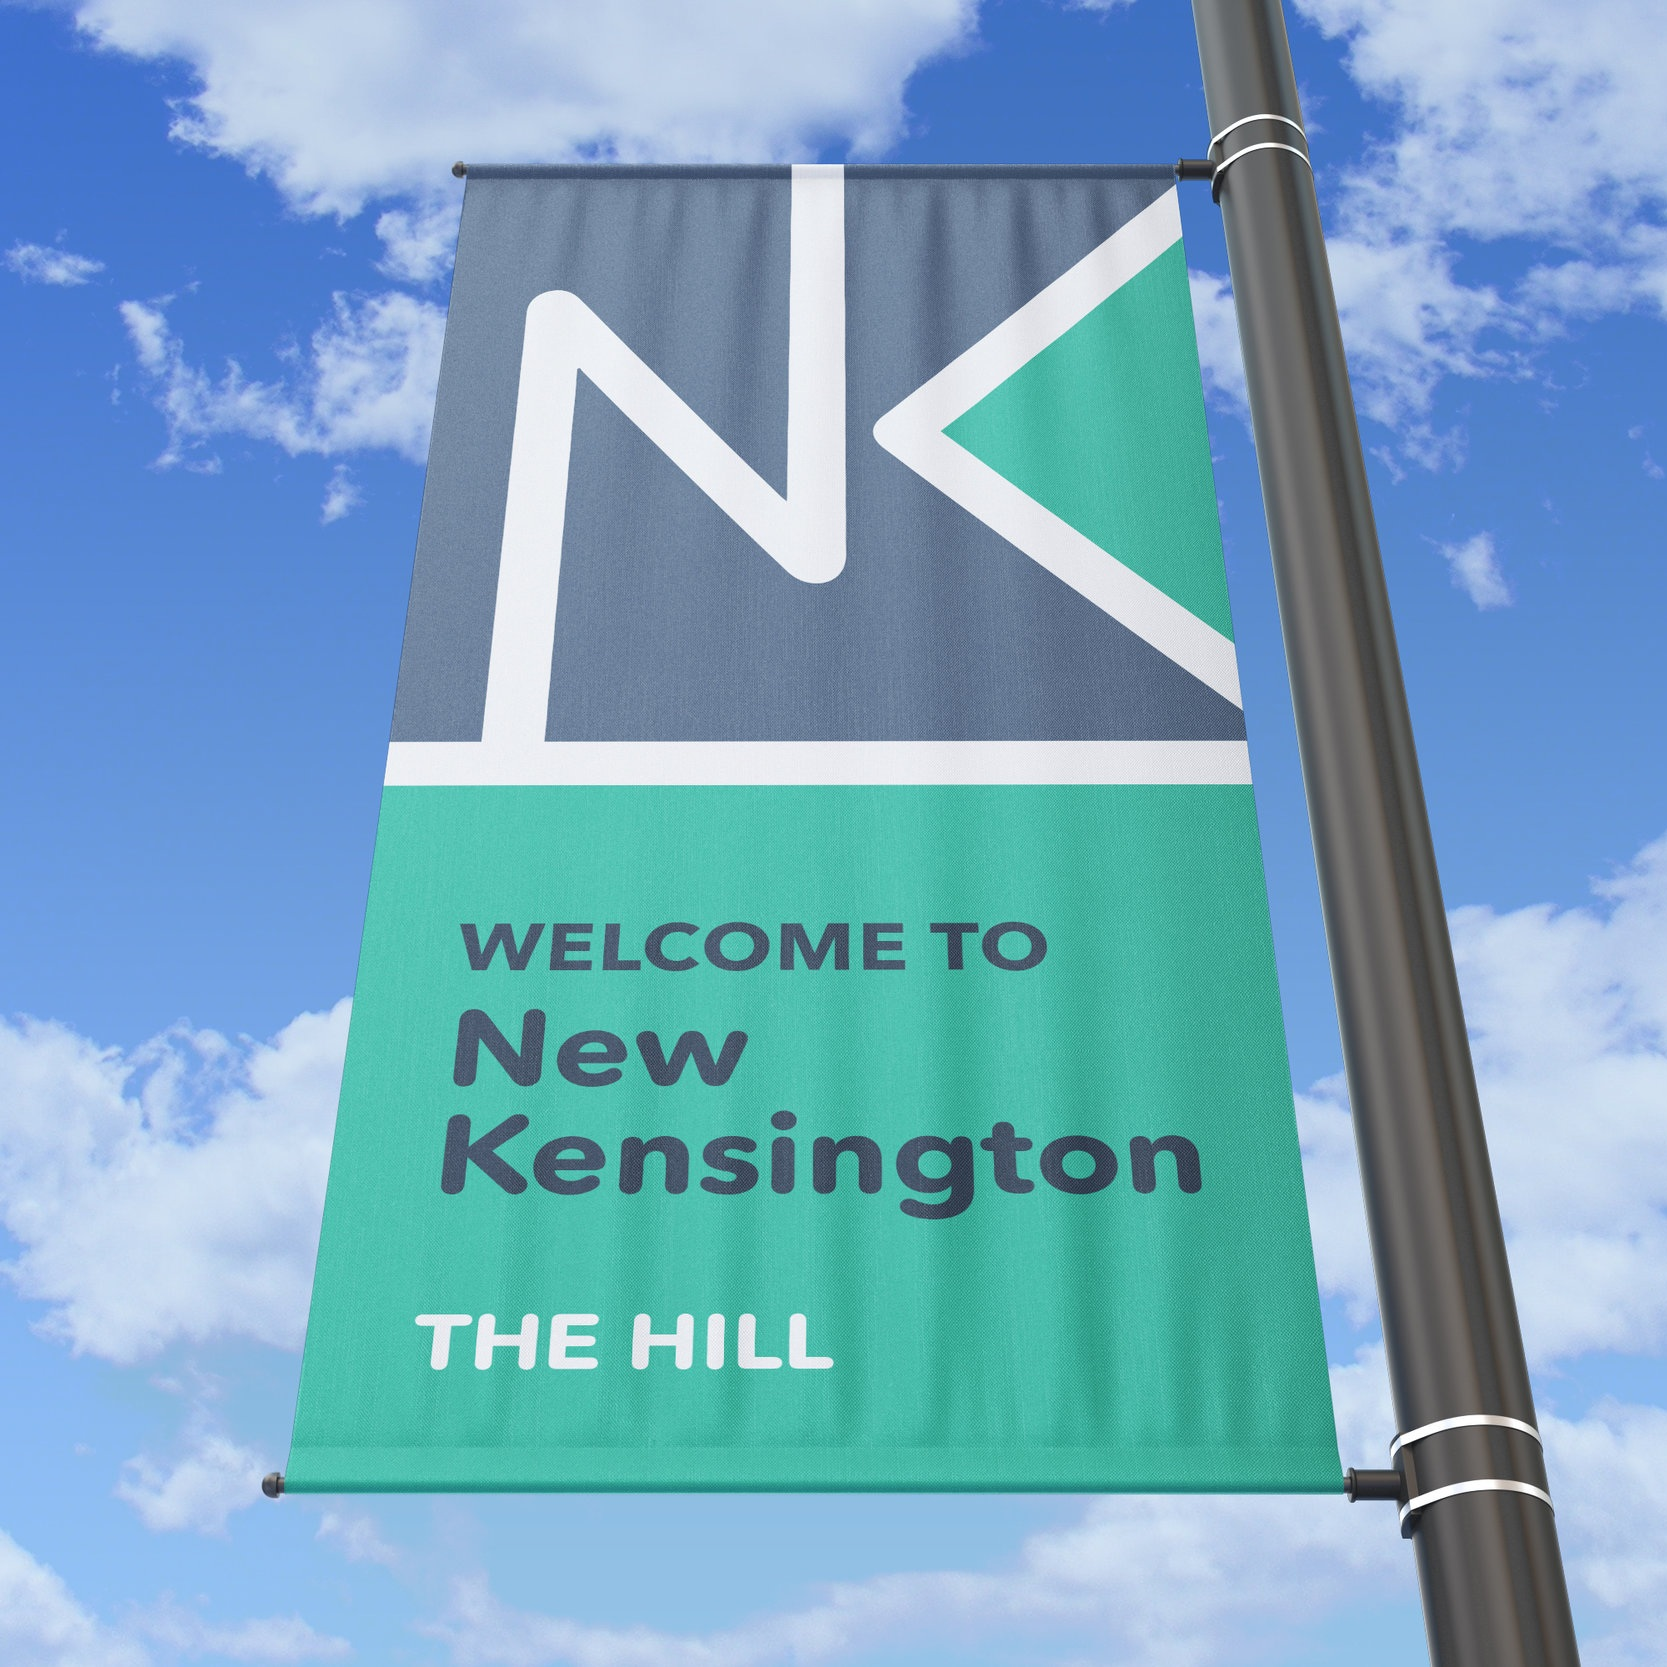 NewKen_Welcome_Poster_Concept2_TheHill.jpg